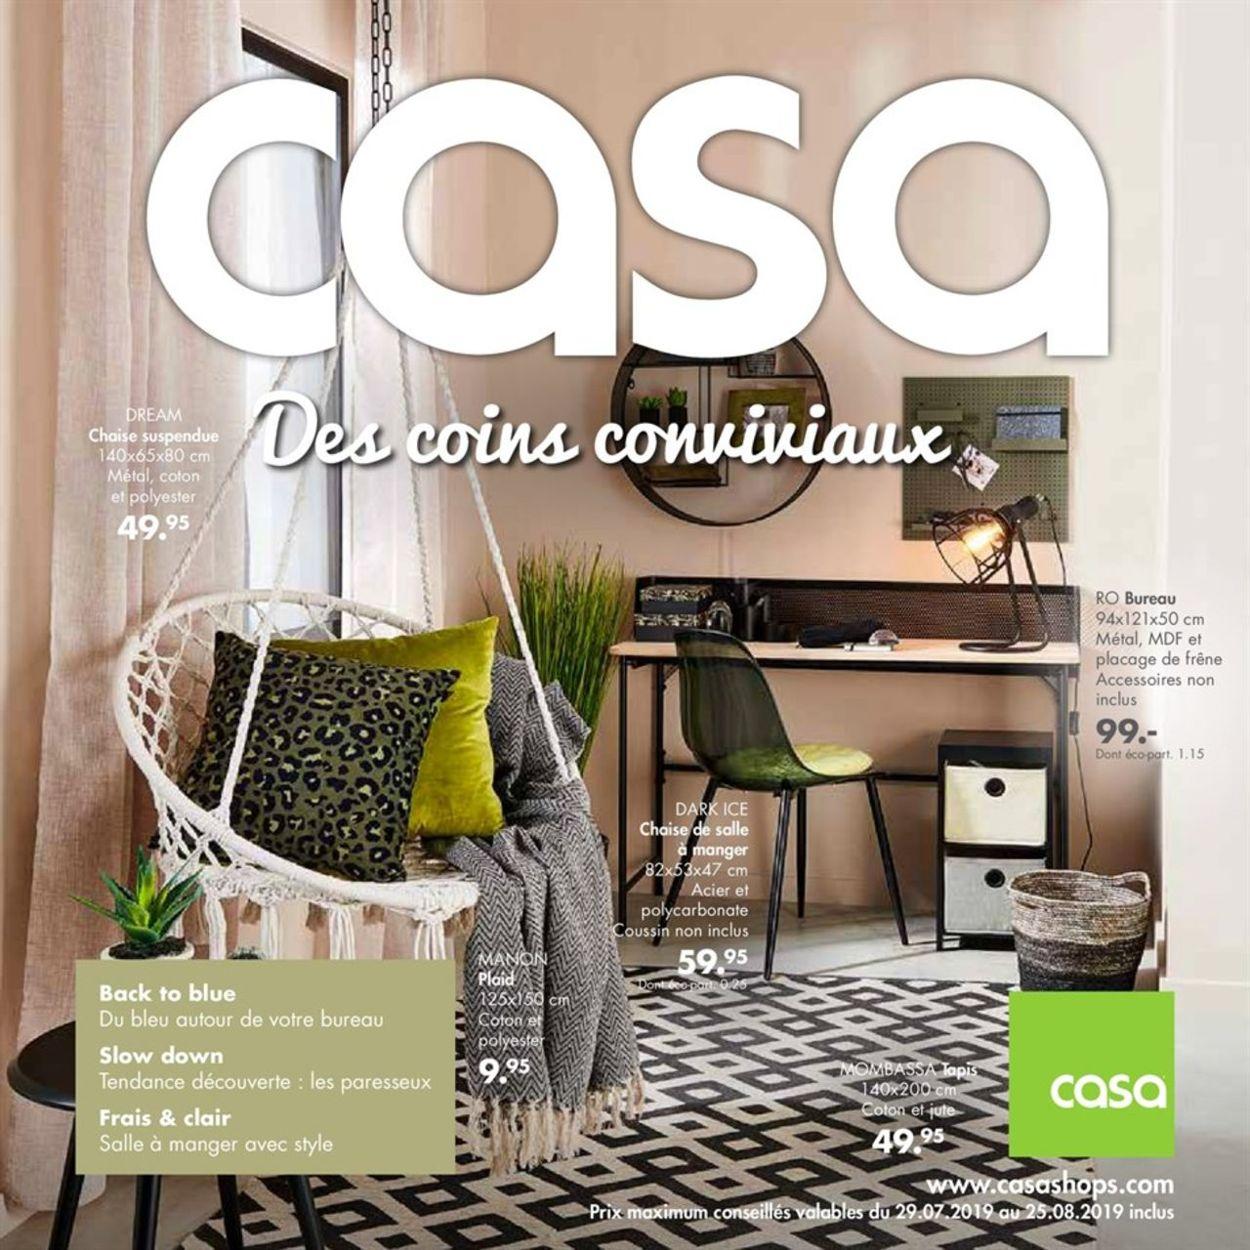 Casa Catalogue - 29.07-25.08.2019